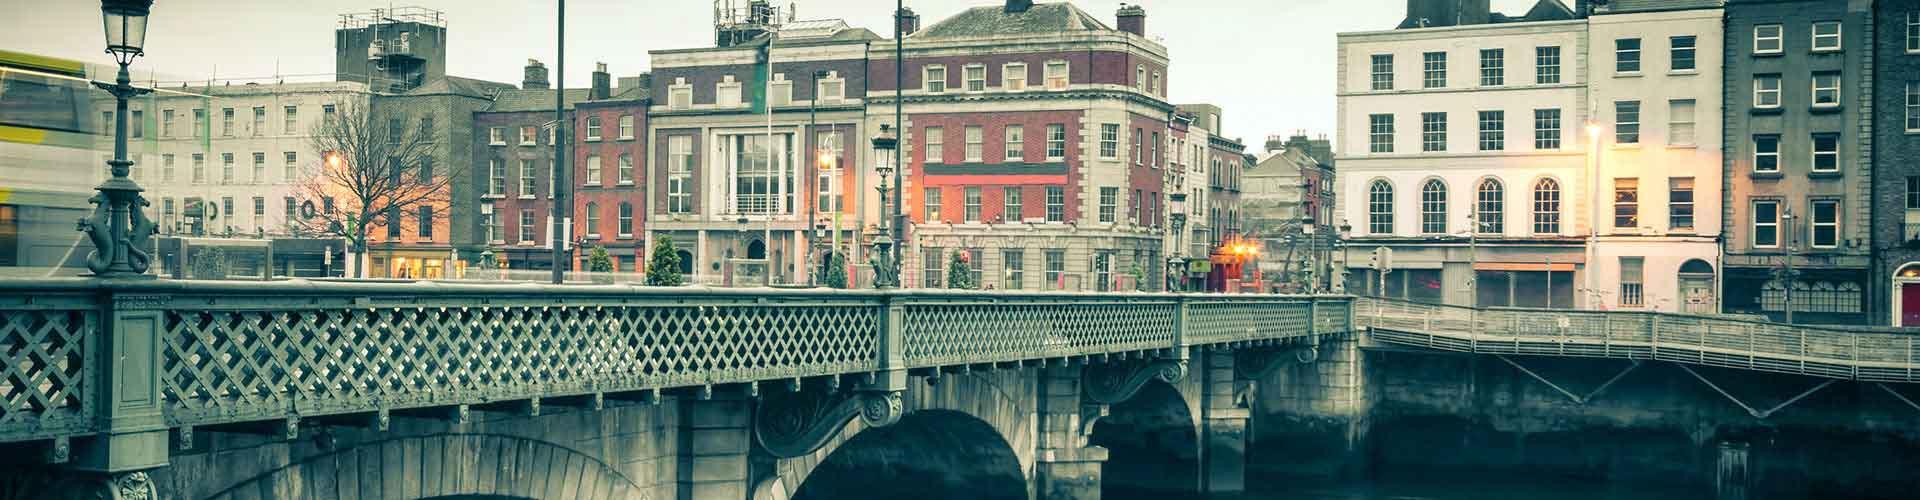 Dublín - Hostales en Dublín. Mapas de Dublín, Fotos y comentarios de cada Hostal en Dublín.